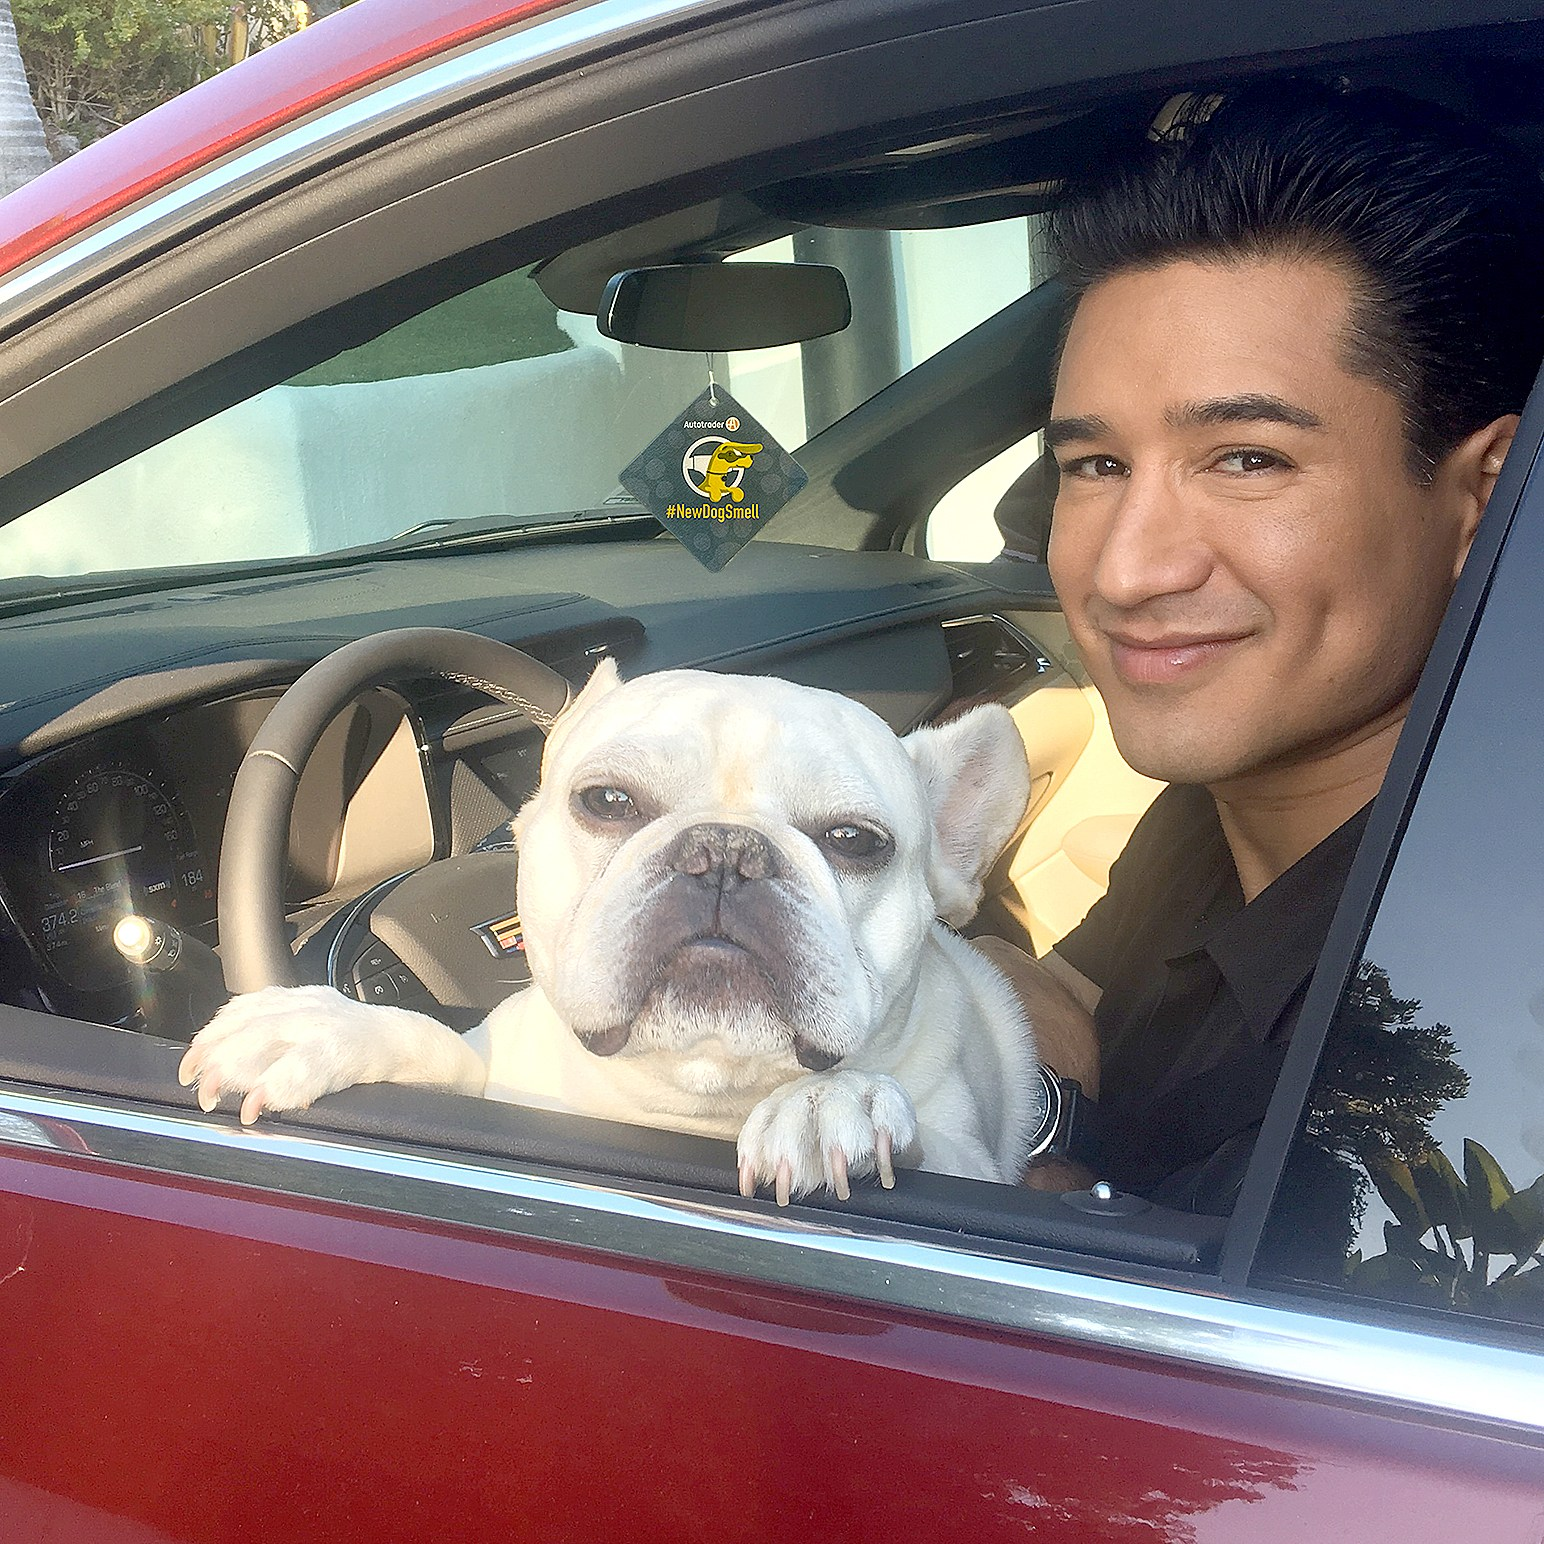 Mario and his dog Julio